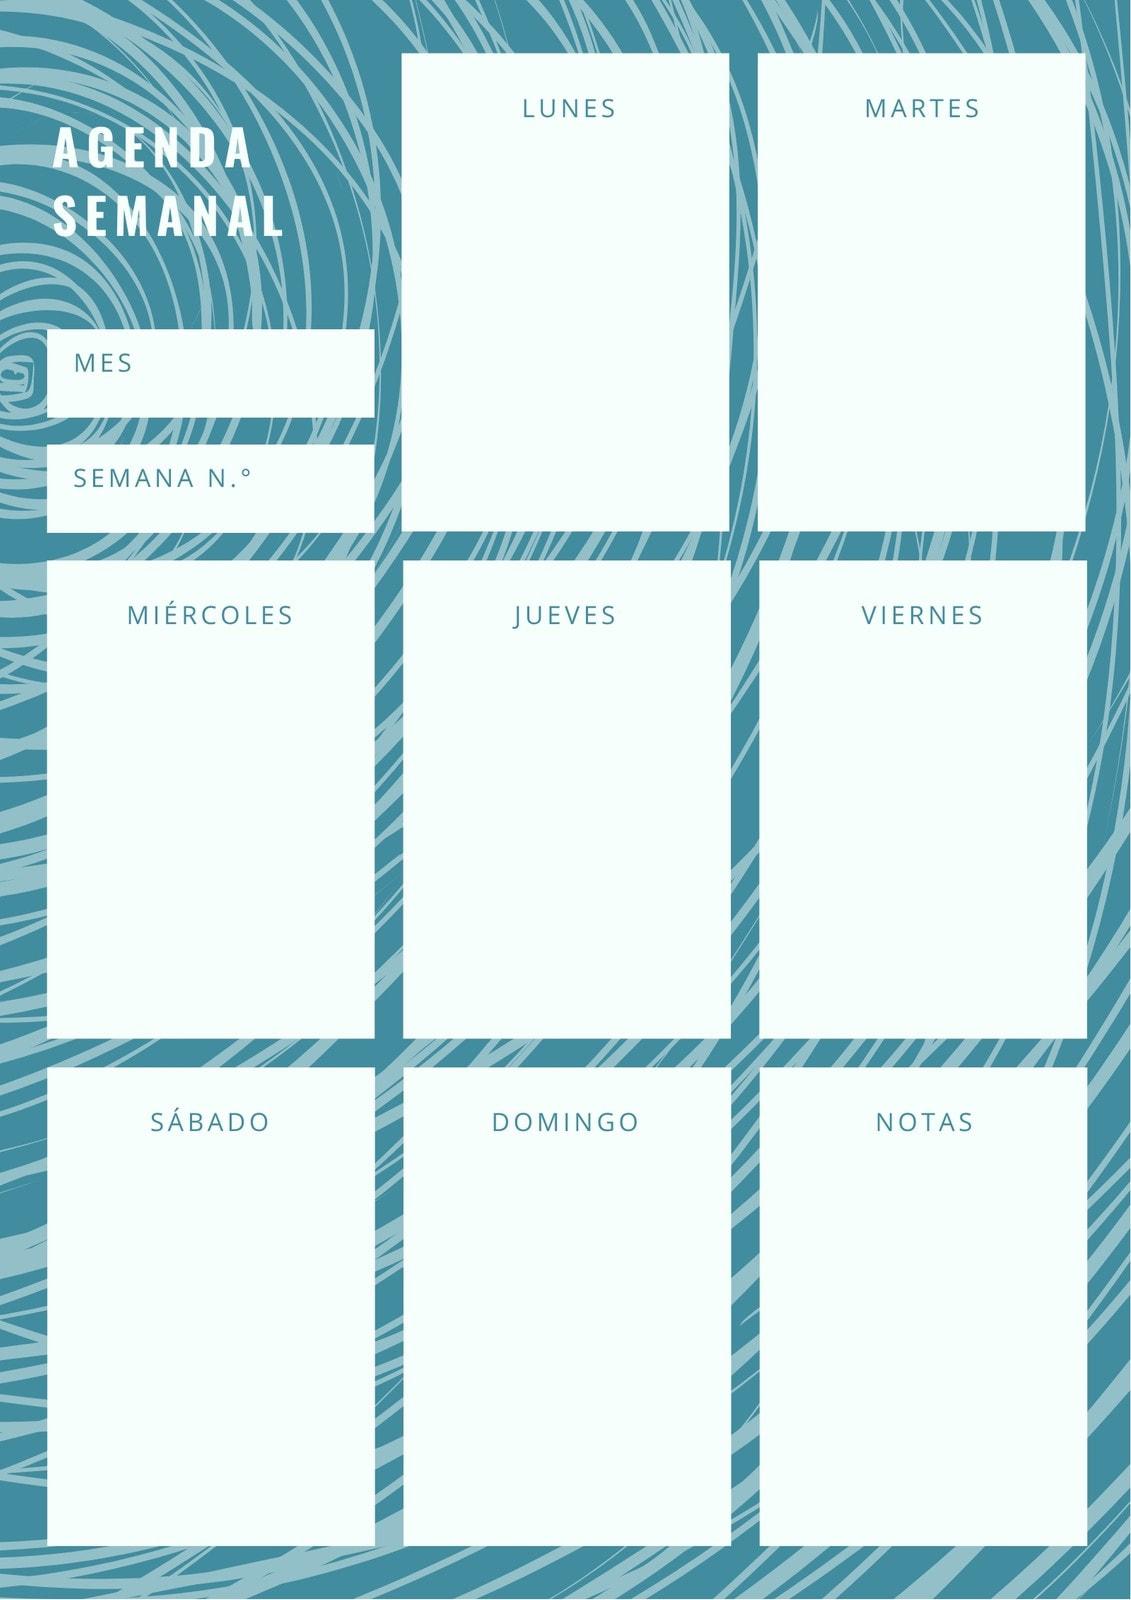 Azul Patrón de Olas Horario Agenda Semanal